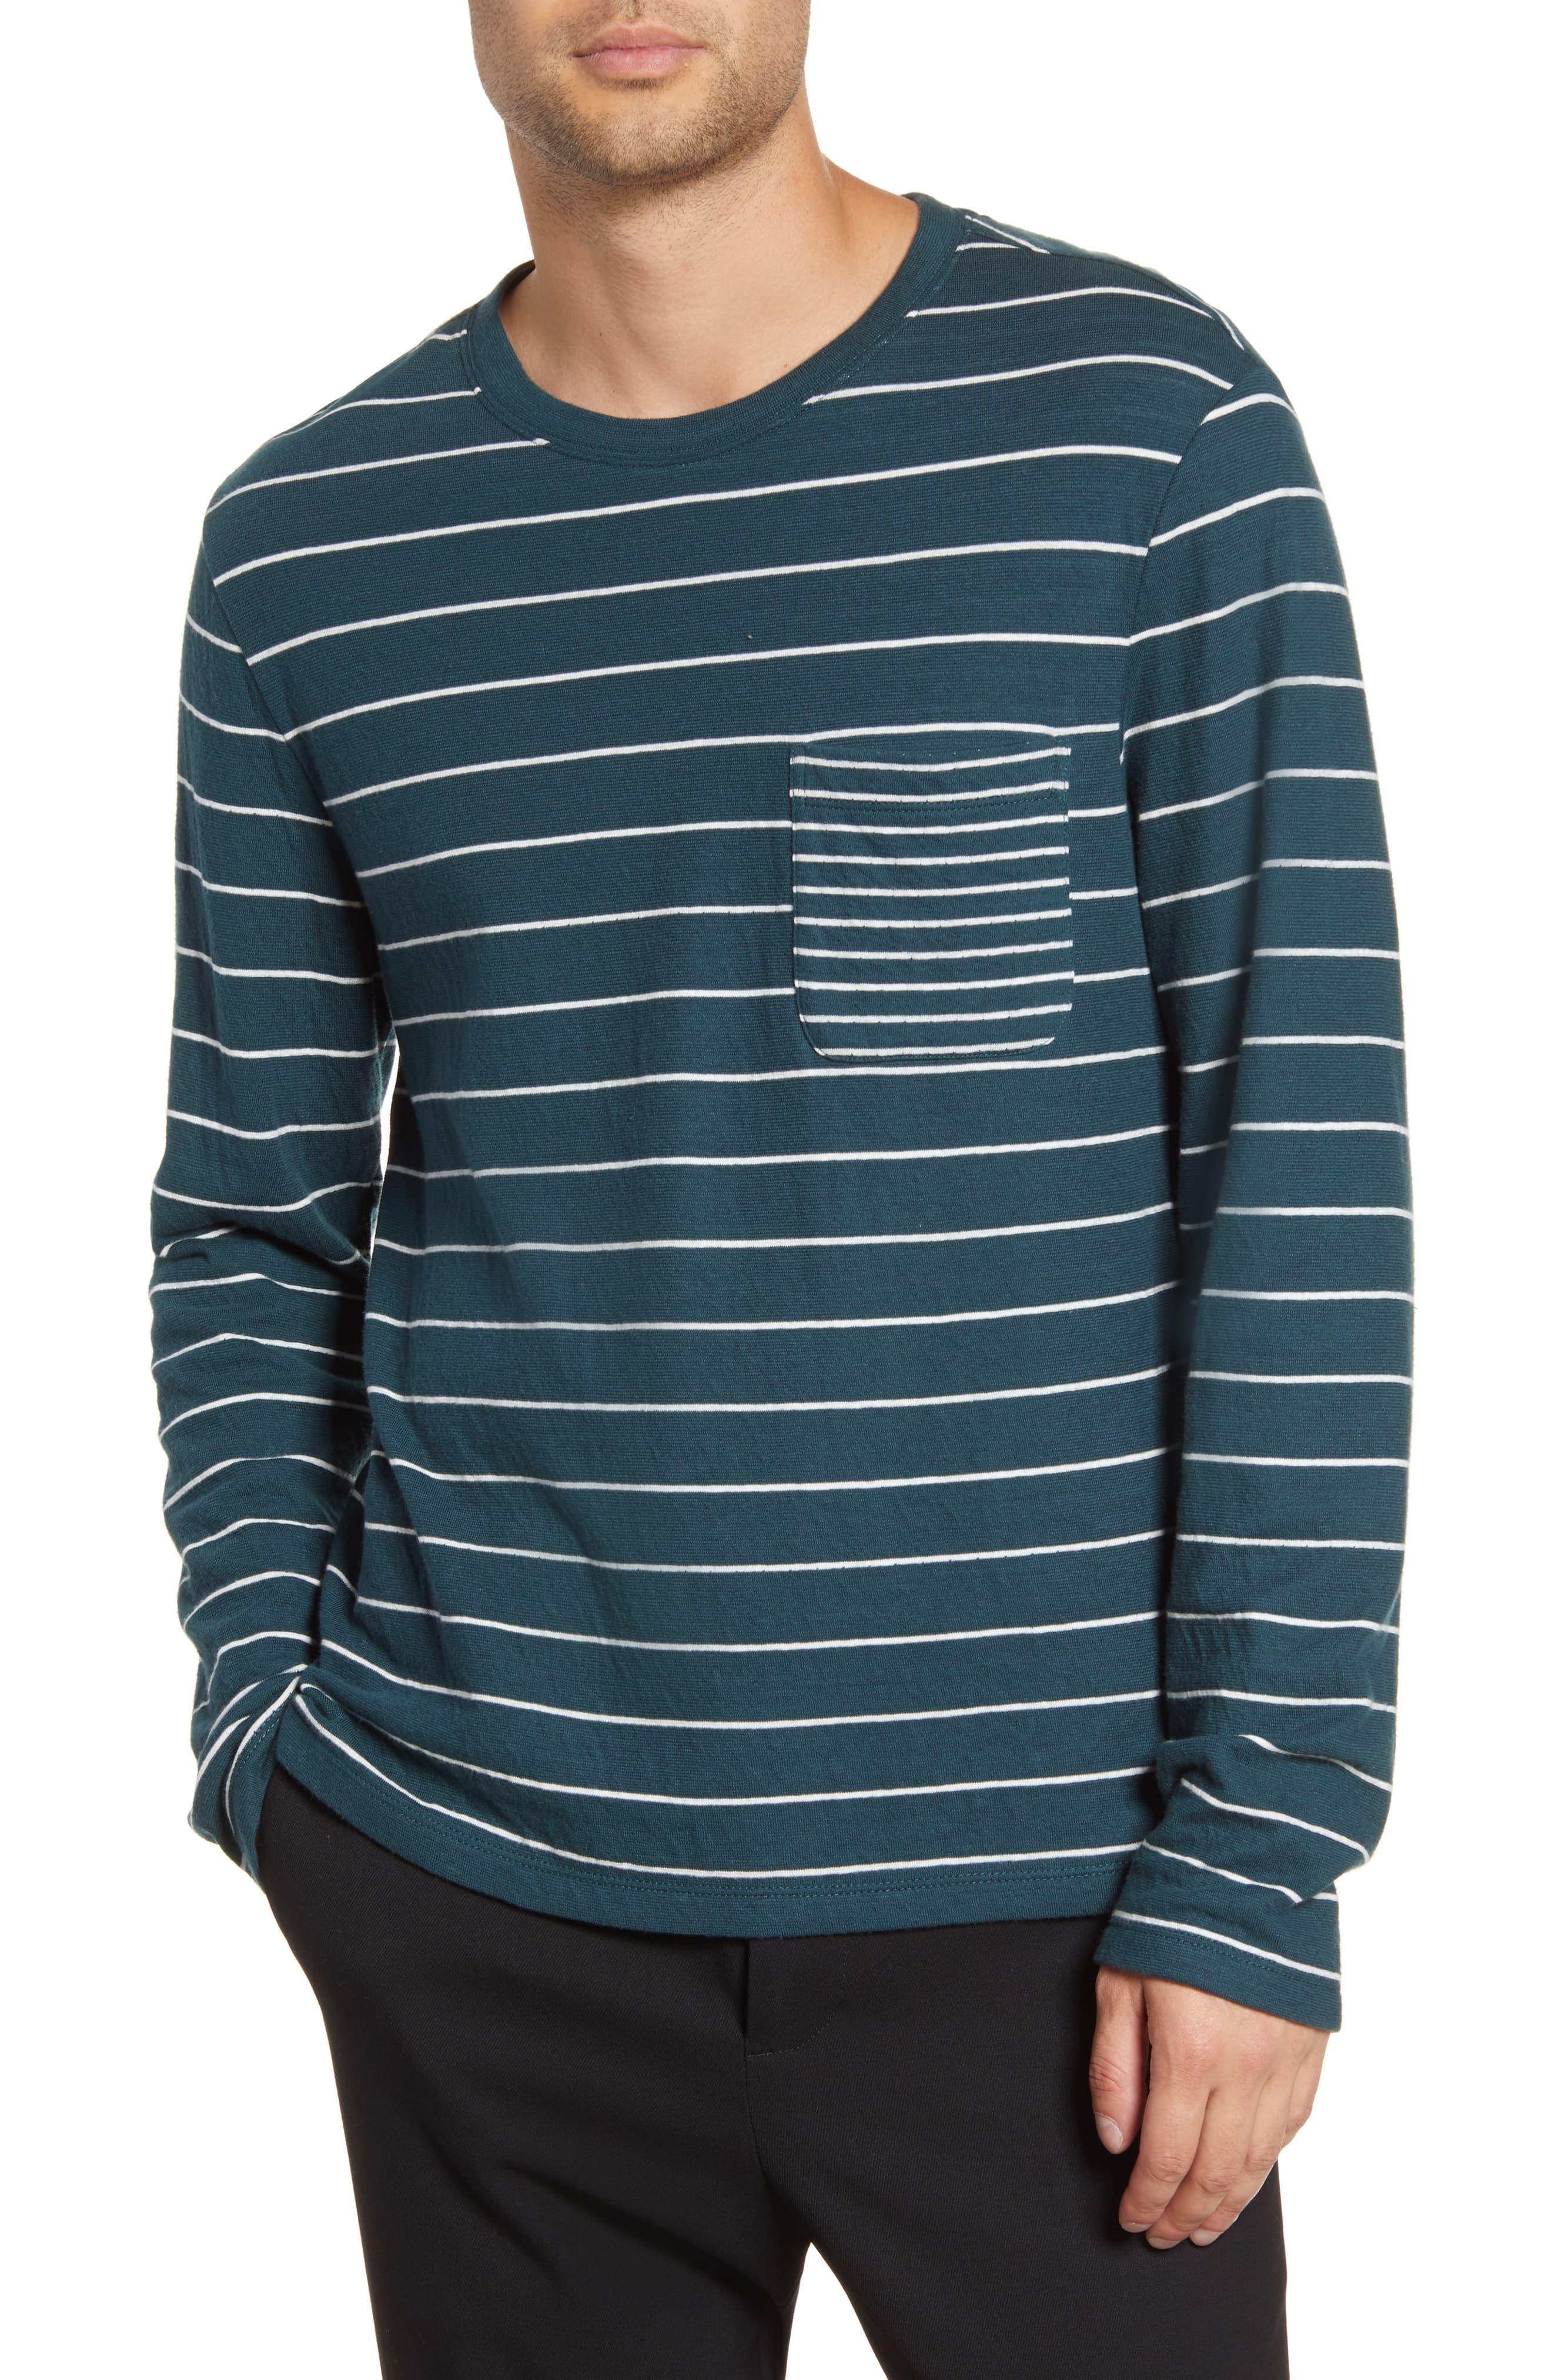 Men's Club Monaco Duofold Slim Stripe Pocket T-Shirt, Size X-Small - Green